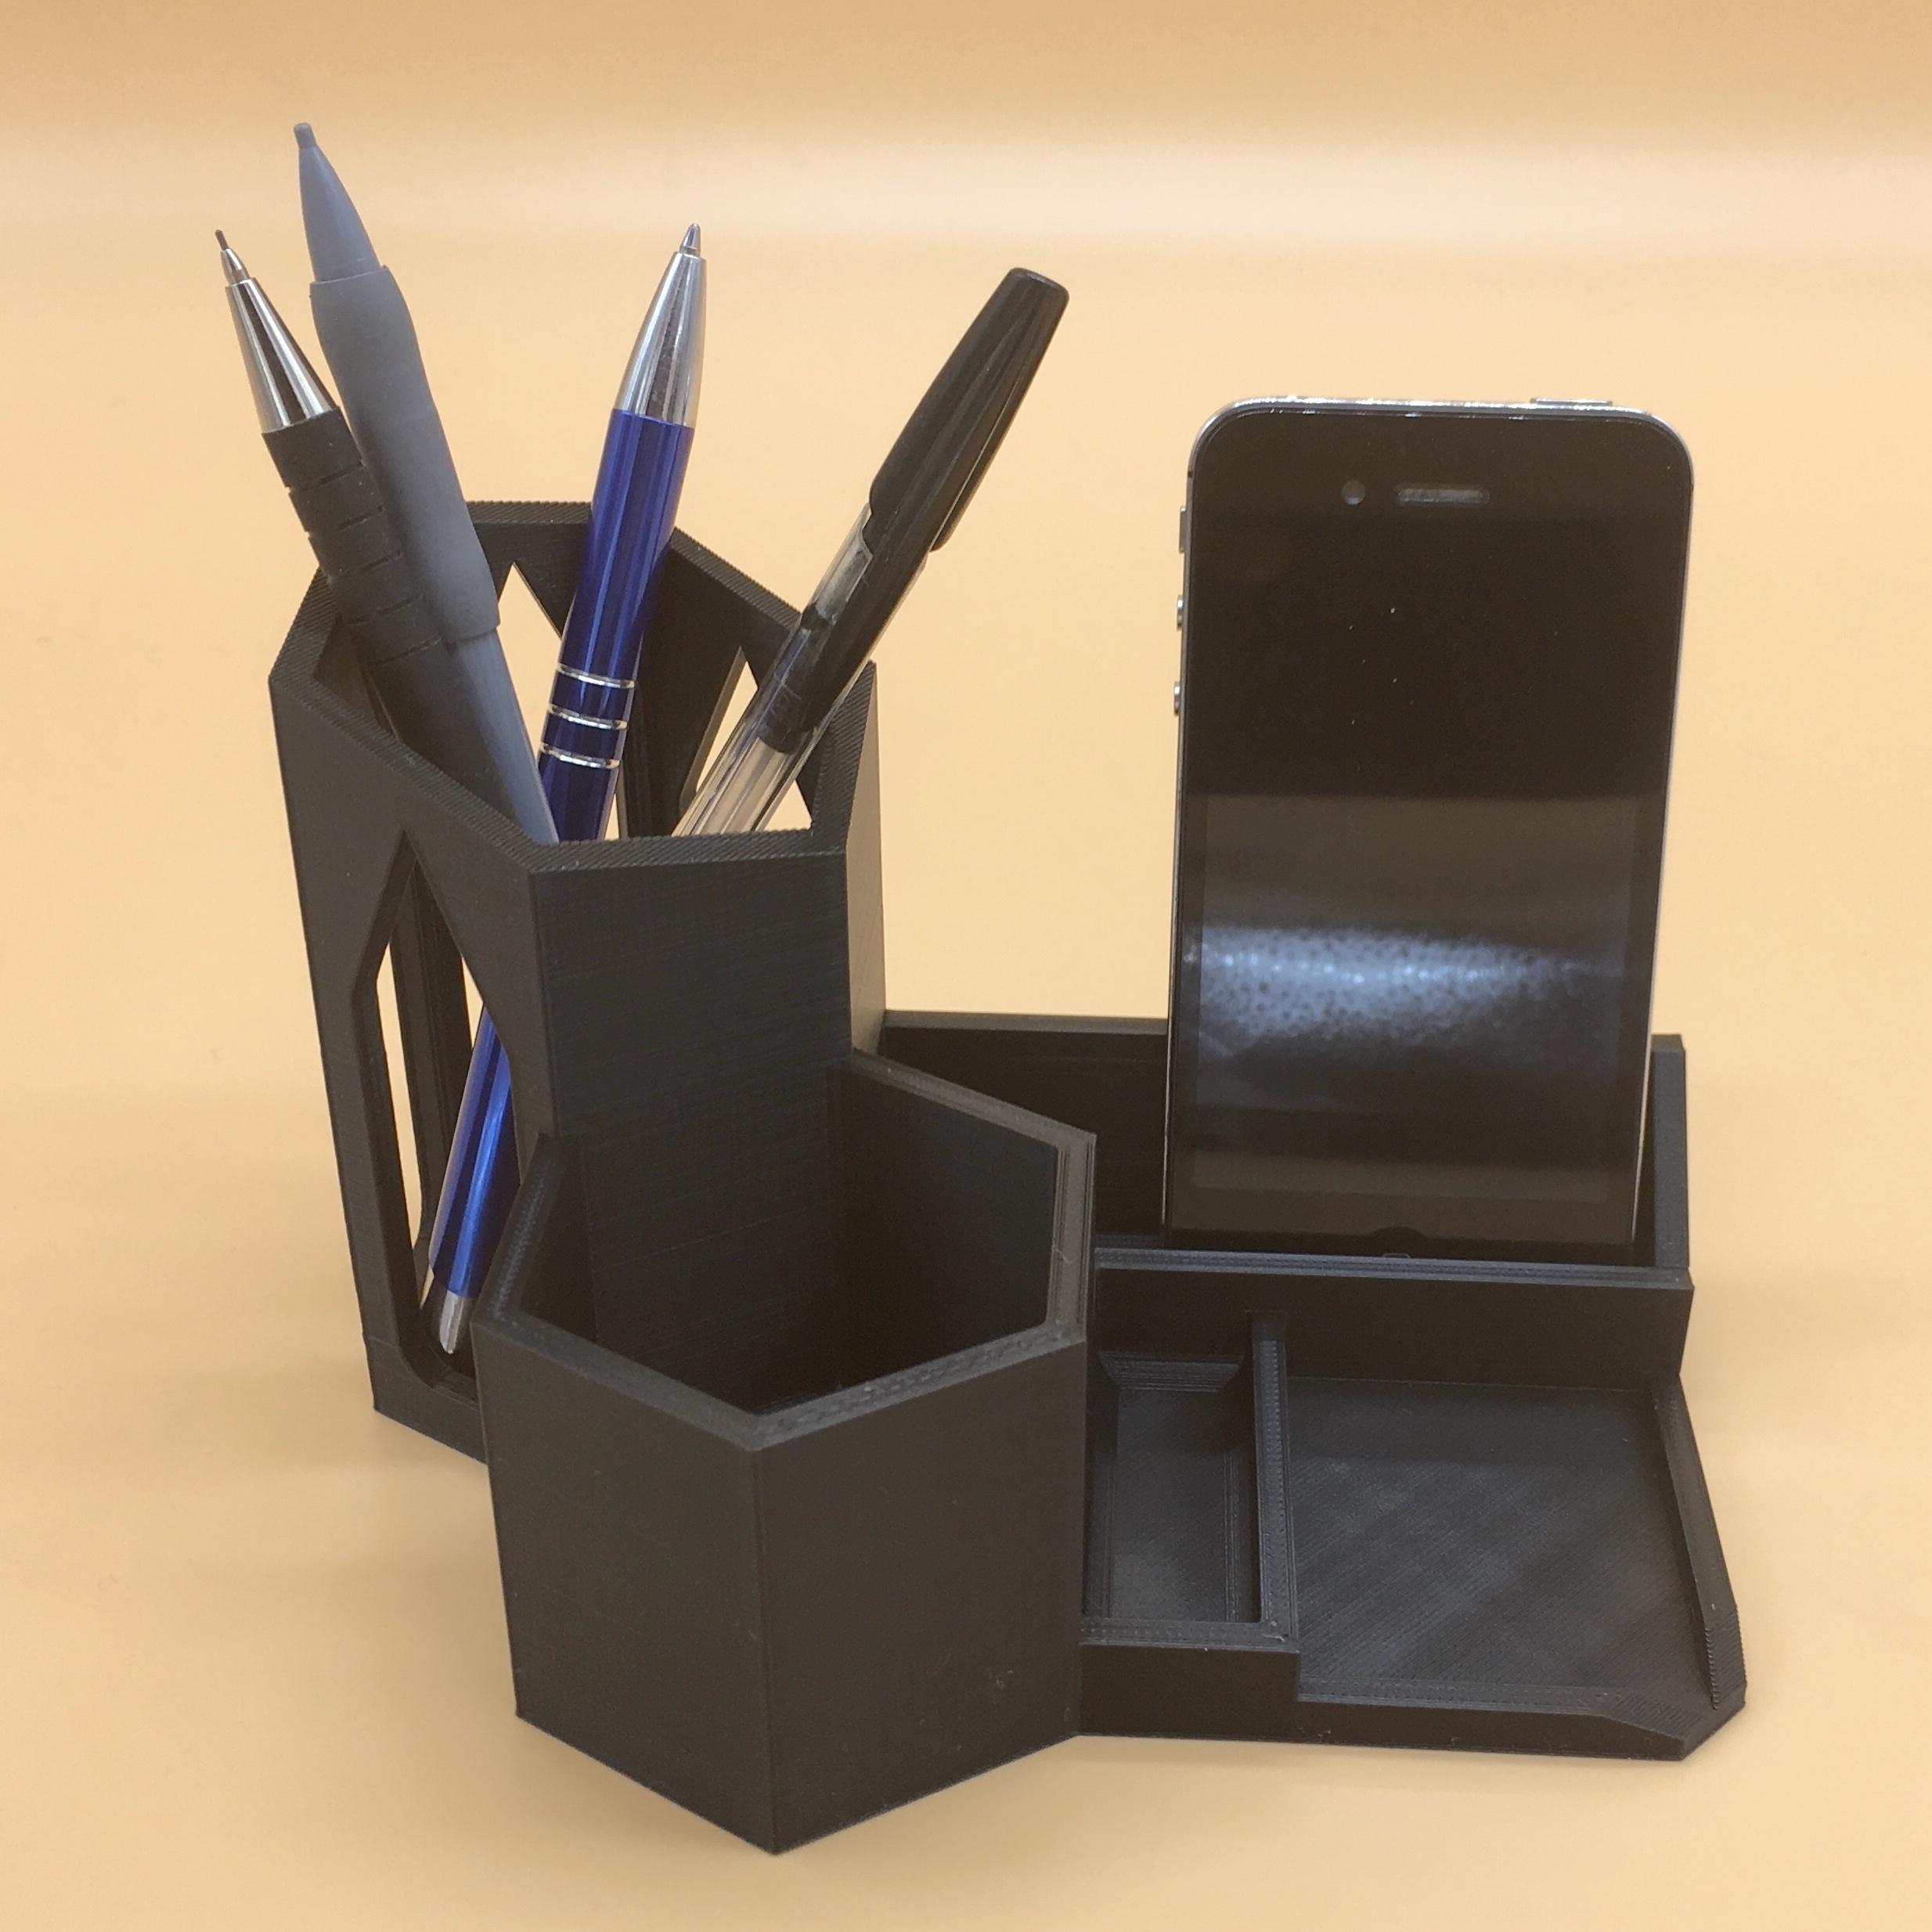 Porte Organizer Impression Pot 3d À Desk Crayons wX0O8knP